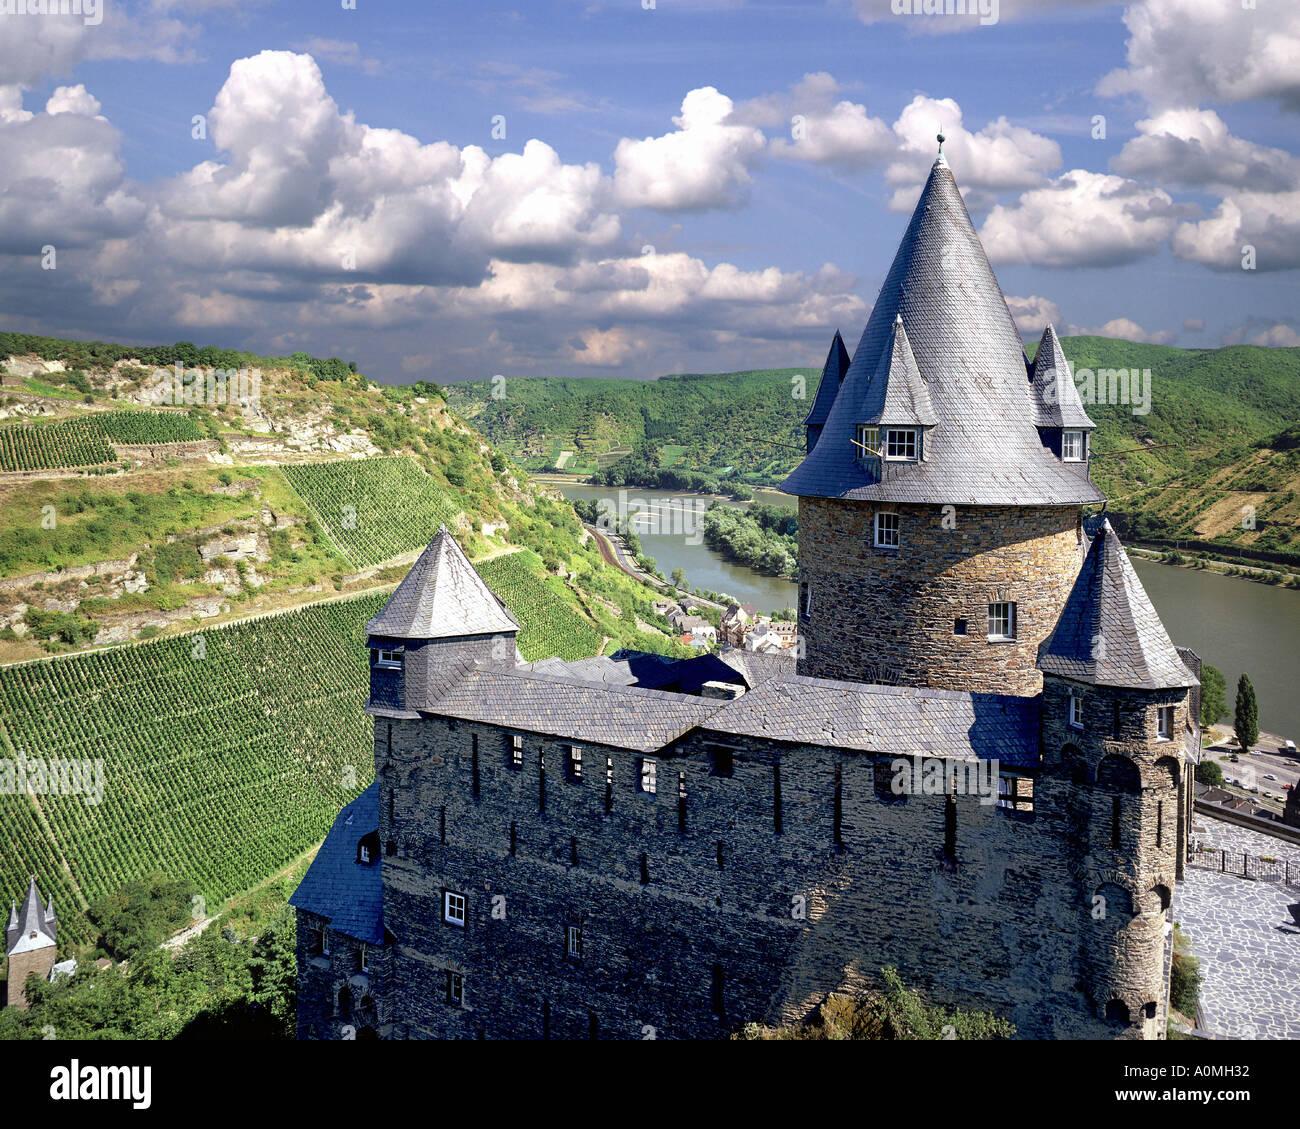 De-Rheinland Pfalz: Burg Stahleck über dem Rhein Stockbild